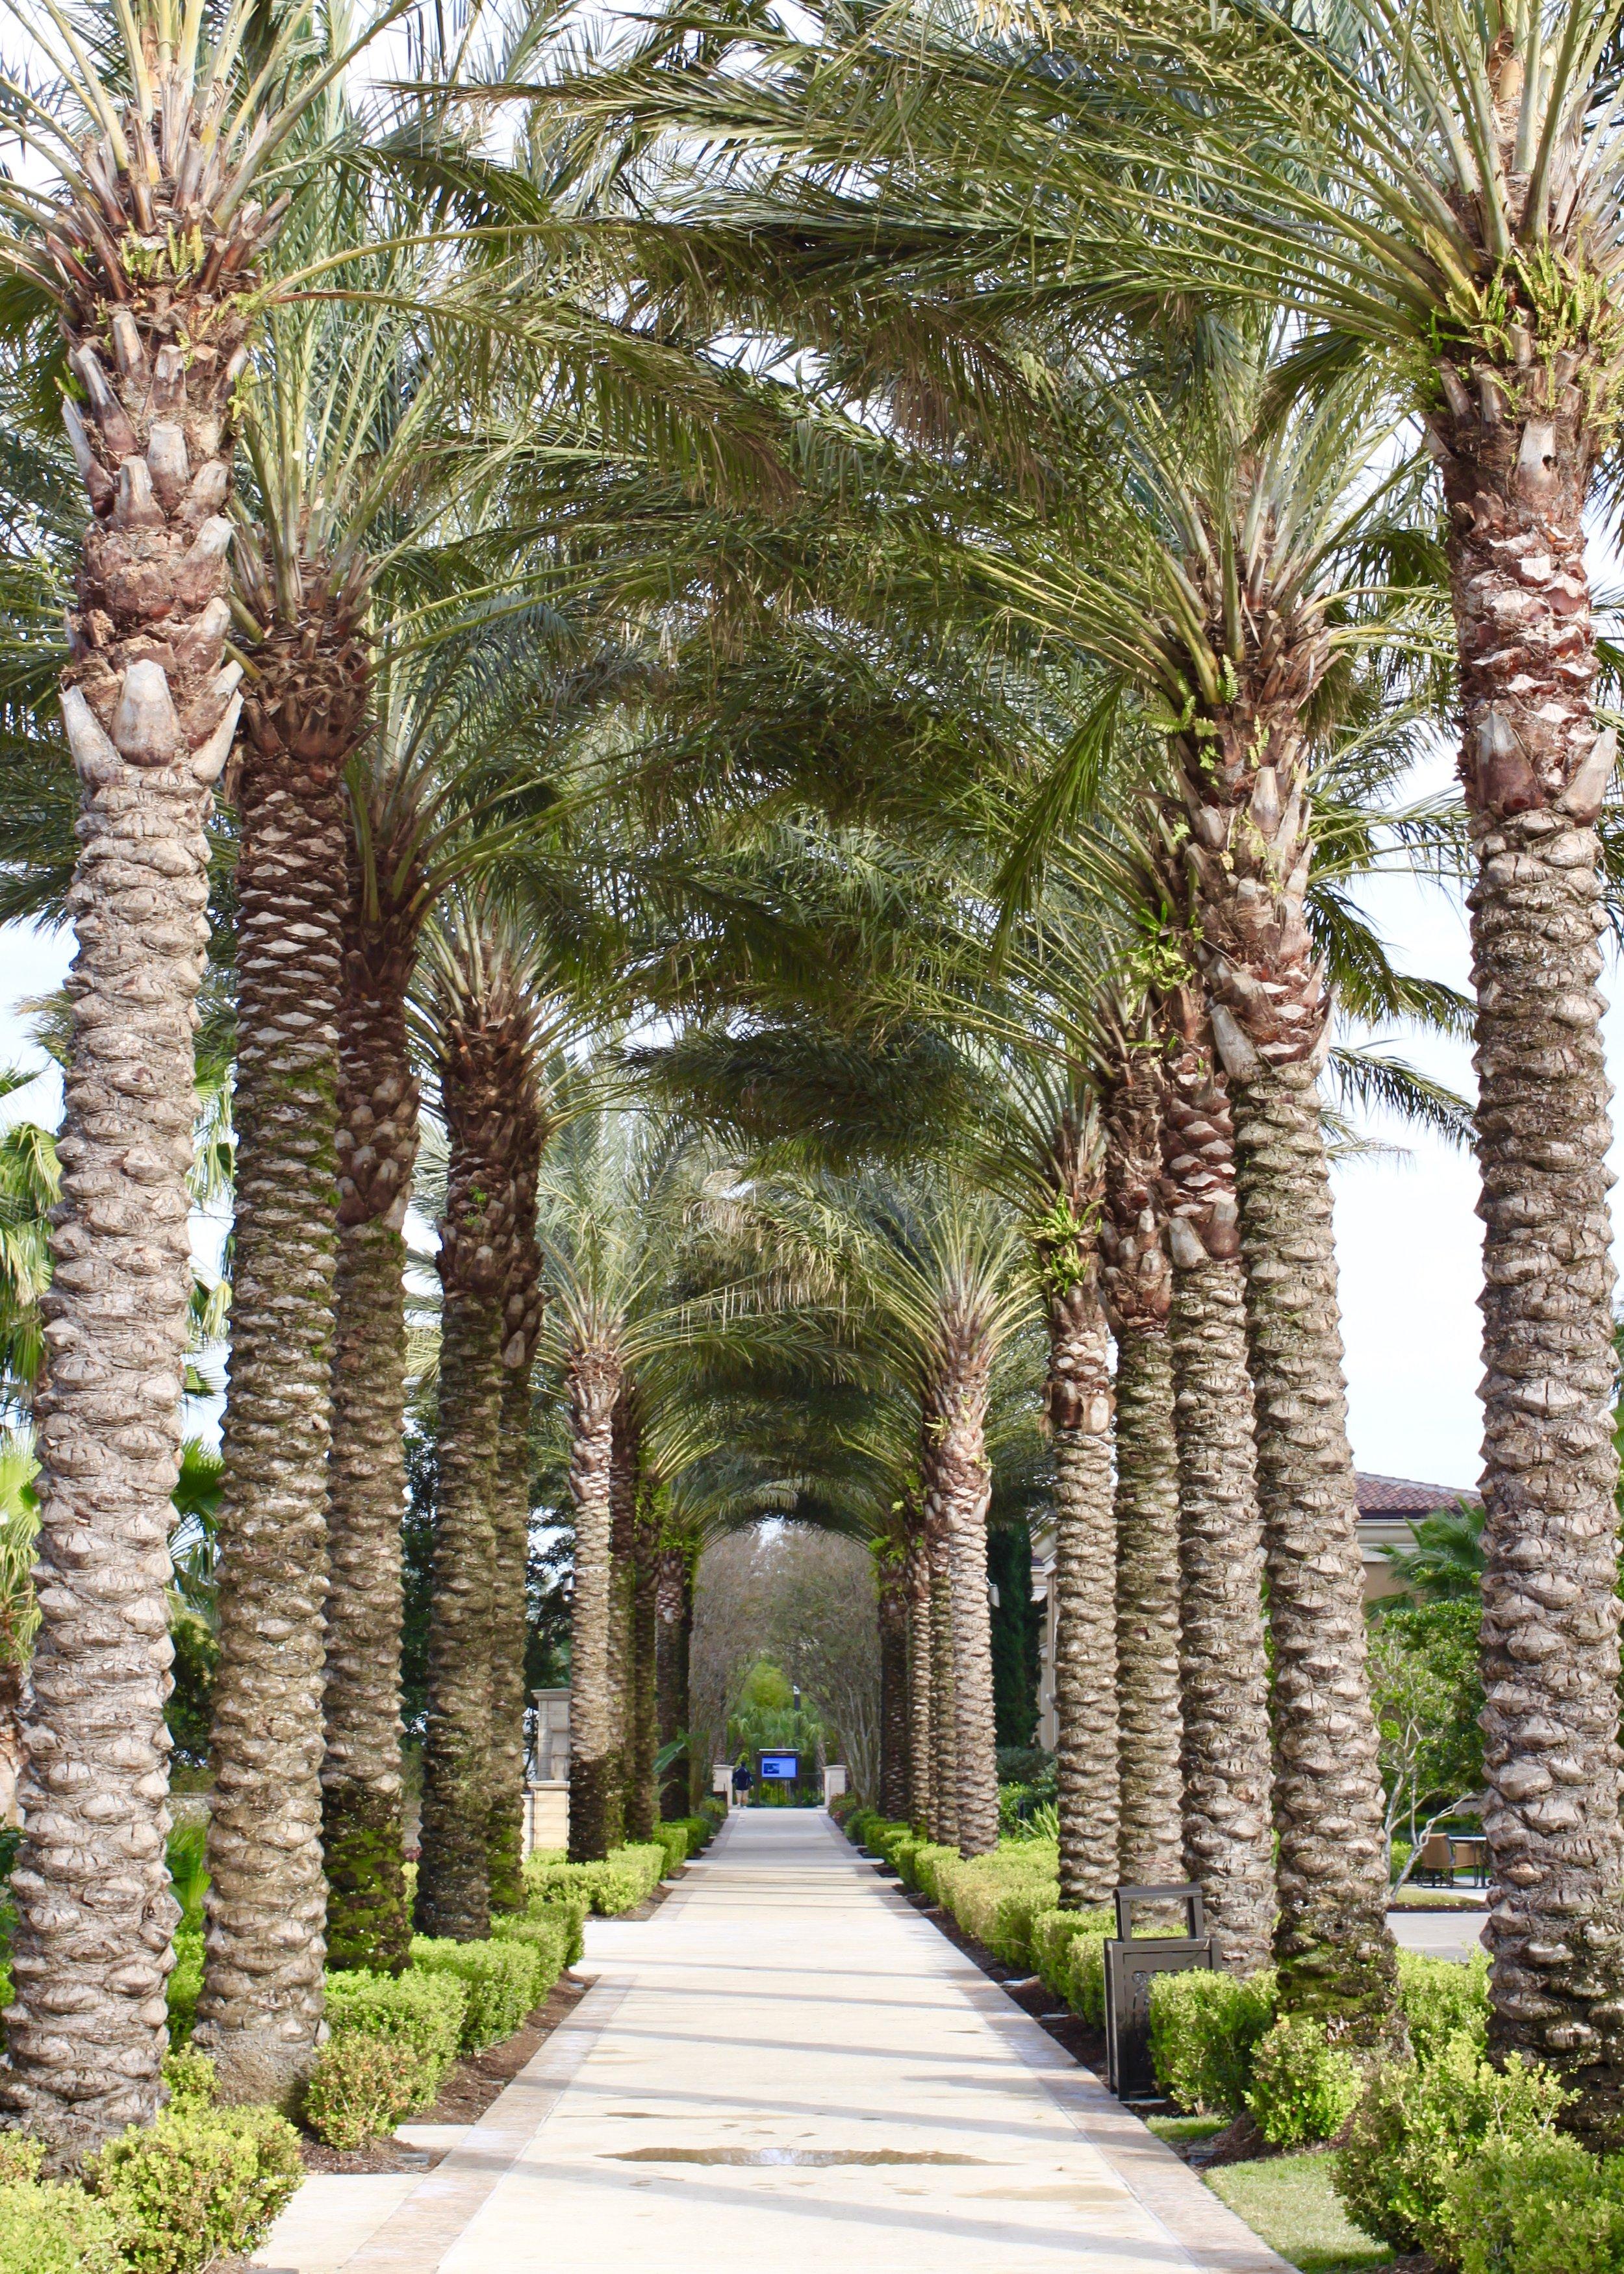 Instagram-worthy palm trees for days